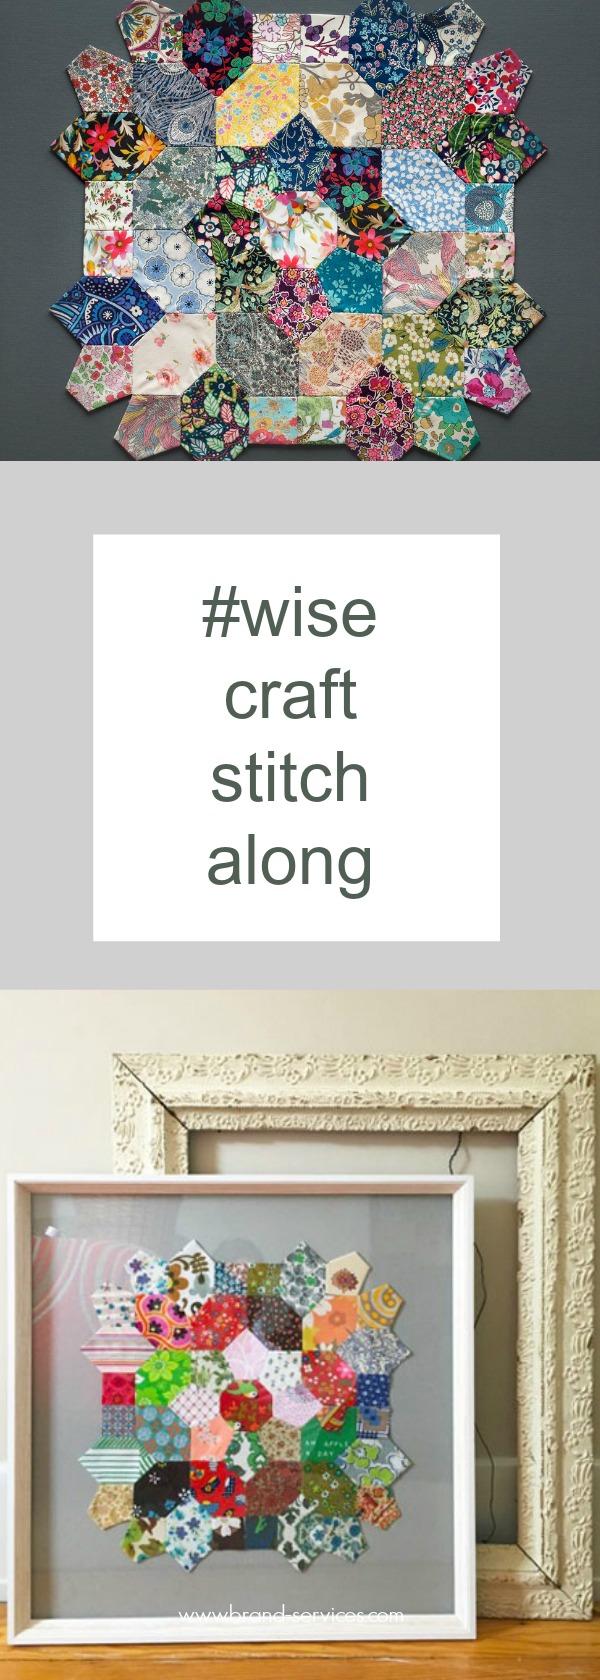 Letu0026#39;s do a Handstitched Stitchalong! - Wise Craft Handmade